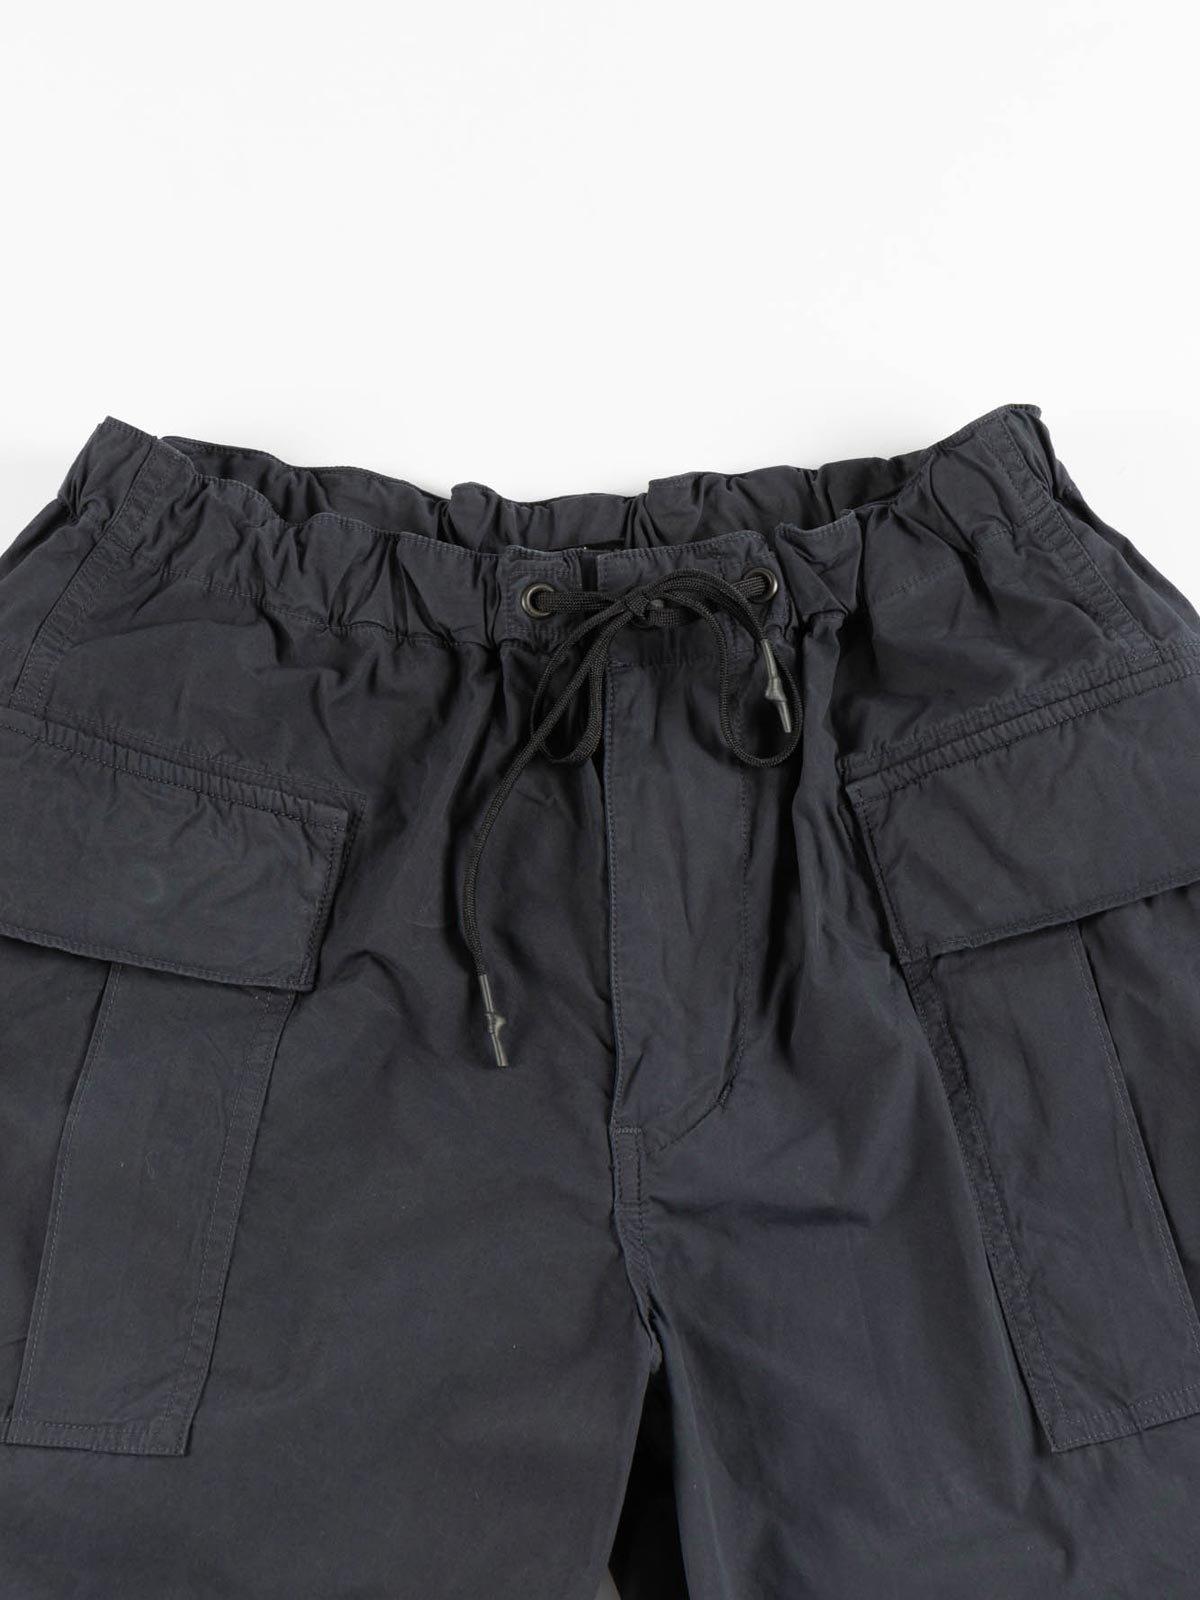 EASY CARGO SHORTS NAVY TYPEWRITER CLOTH - Image 2